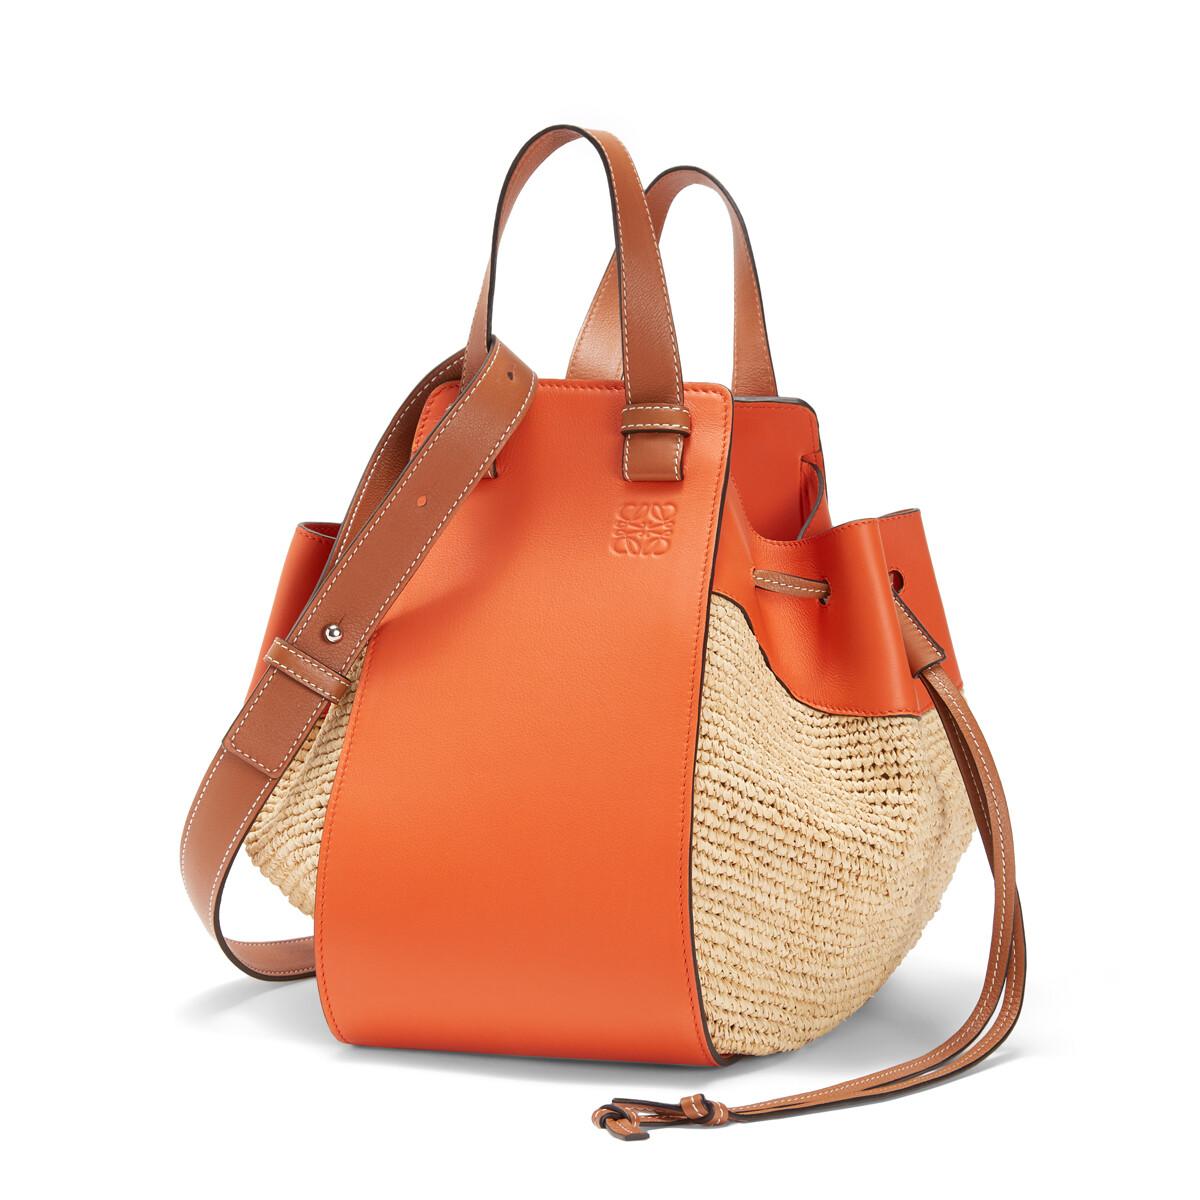 LOEWE Paula's Hammock Drawstring Medium Bag Orange/Natural front